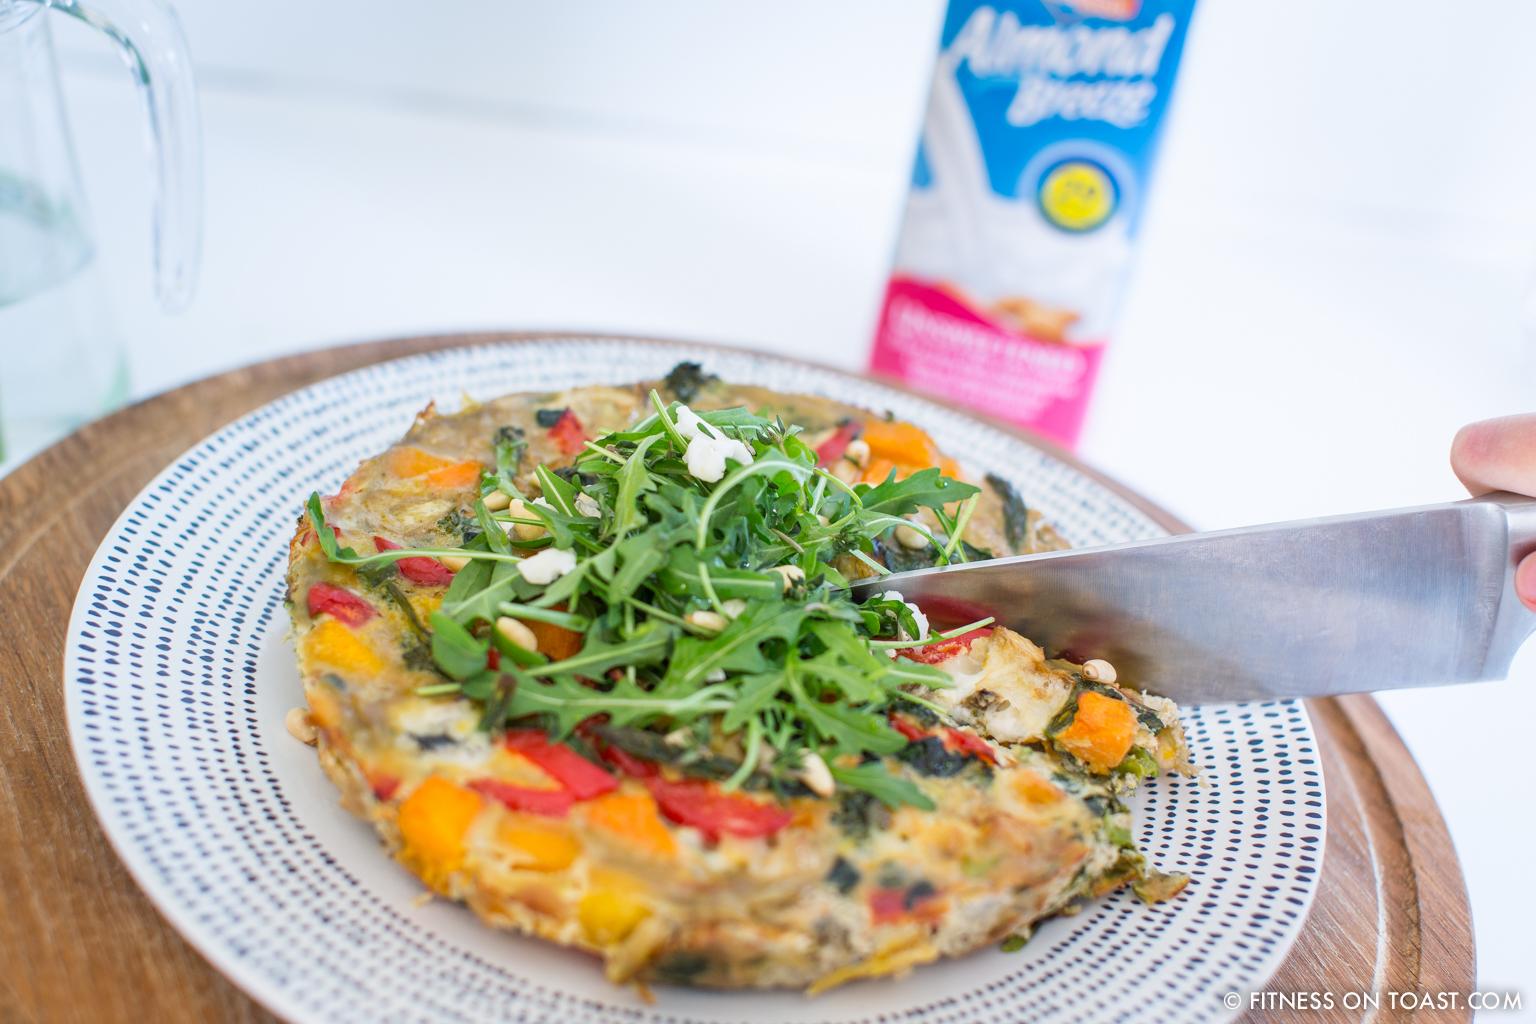 Fitness On Toast Faya Blog Post Blue Diamond Almonds Vegetable Frittata Healthy Recipe Idea Food Blog Recipes-11